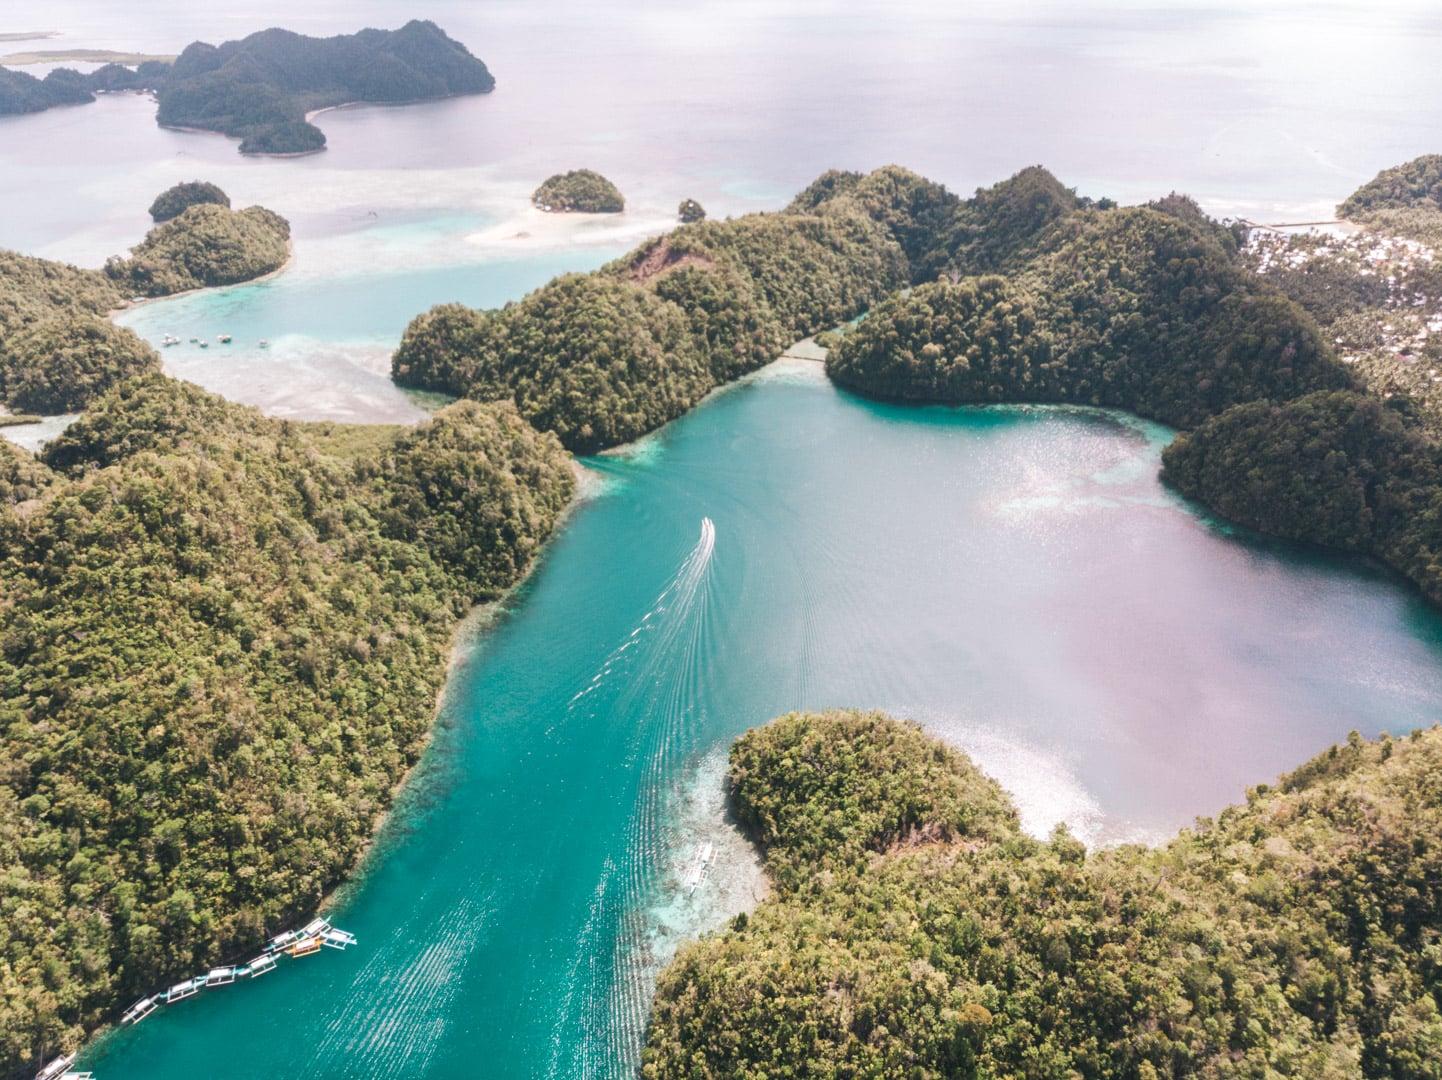 How to get to Sugba Lagoon, Sugba Lagoon